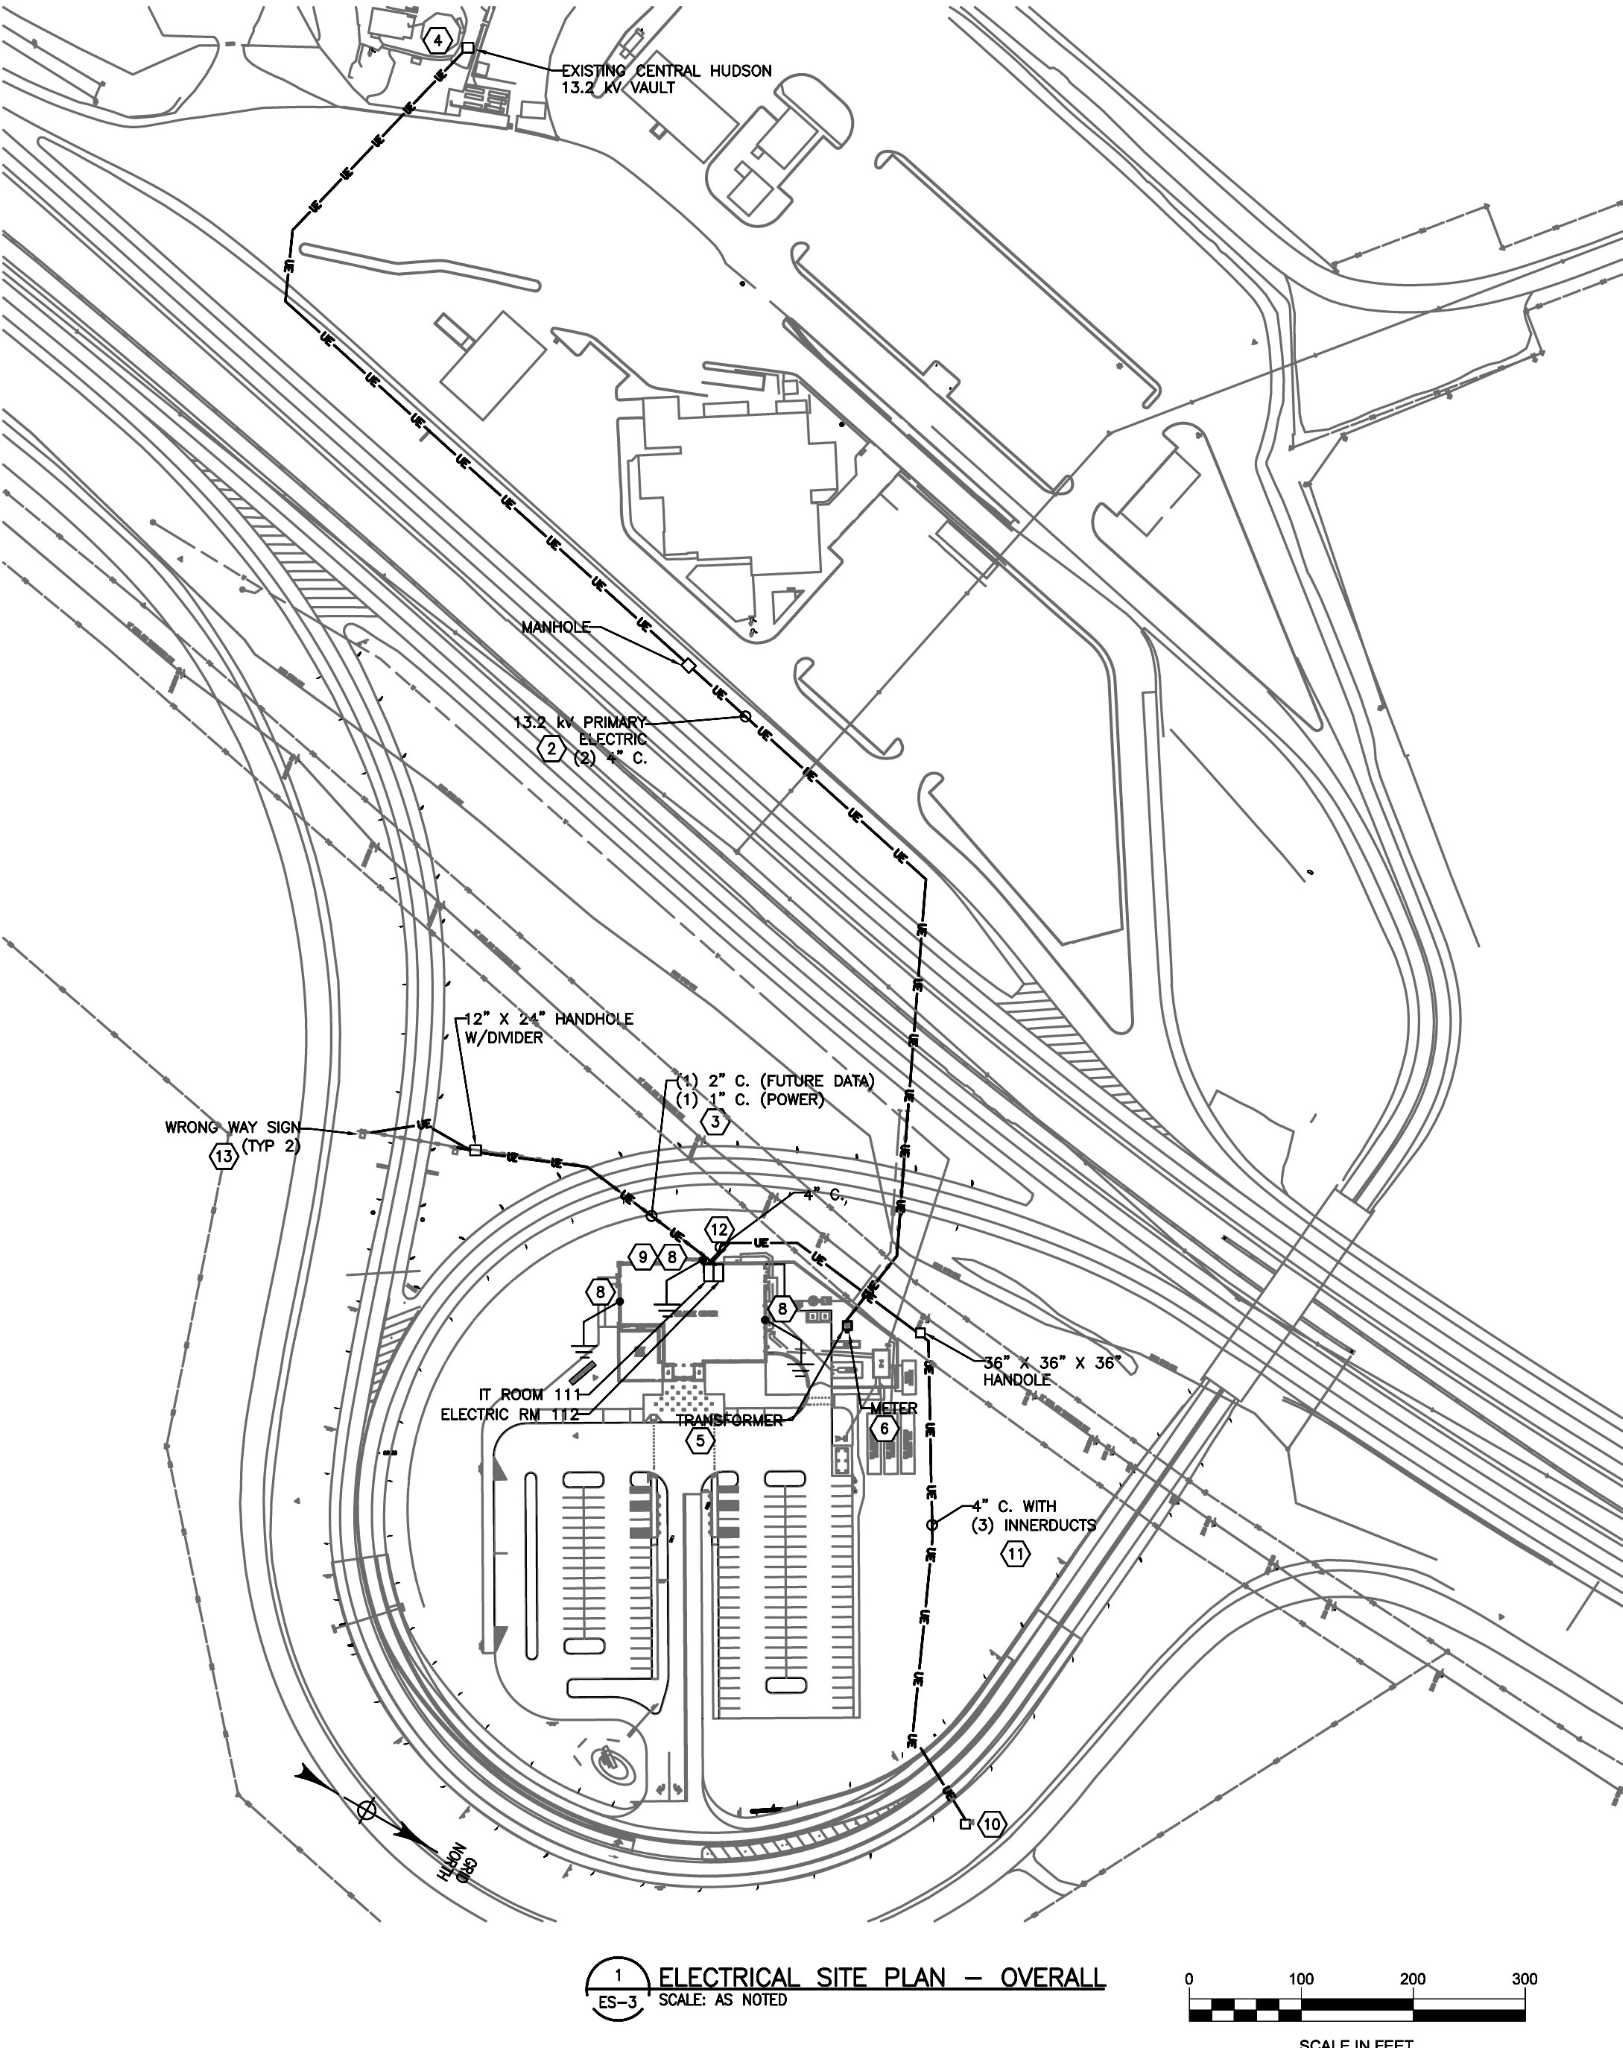 wel e center planned for new baltimore thruway plaza houston Entry Level Attorney Resume wel e center planned for new baltimore thruway plaza